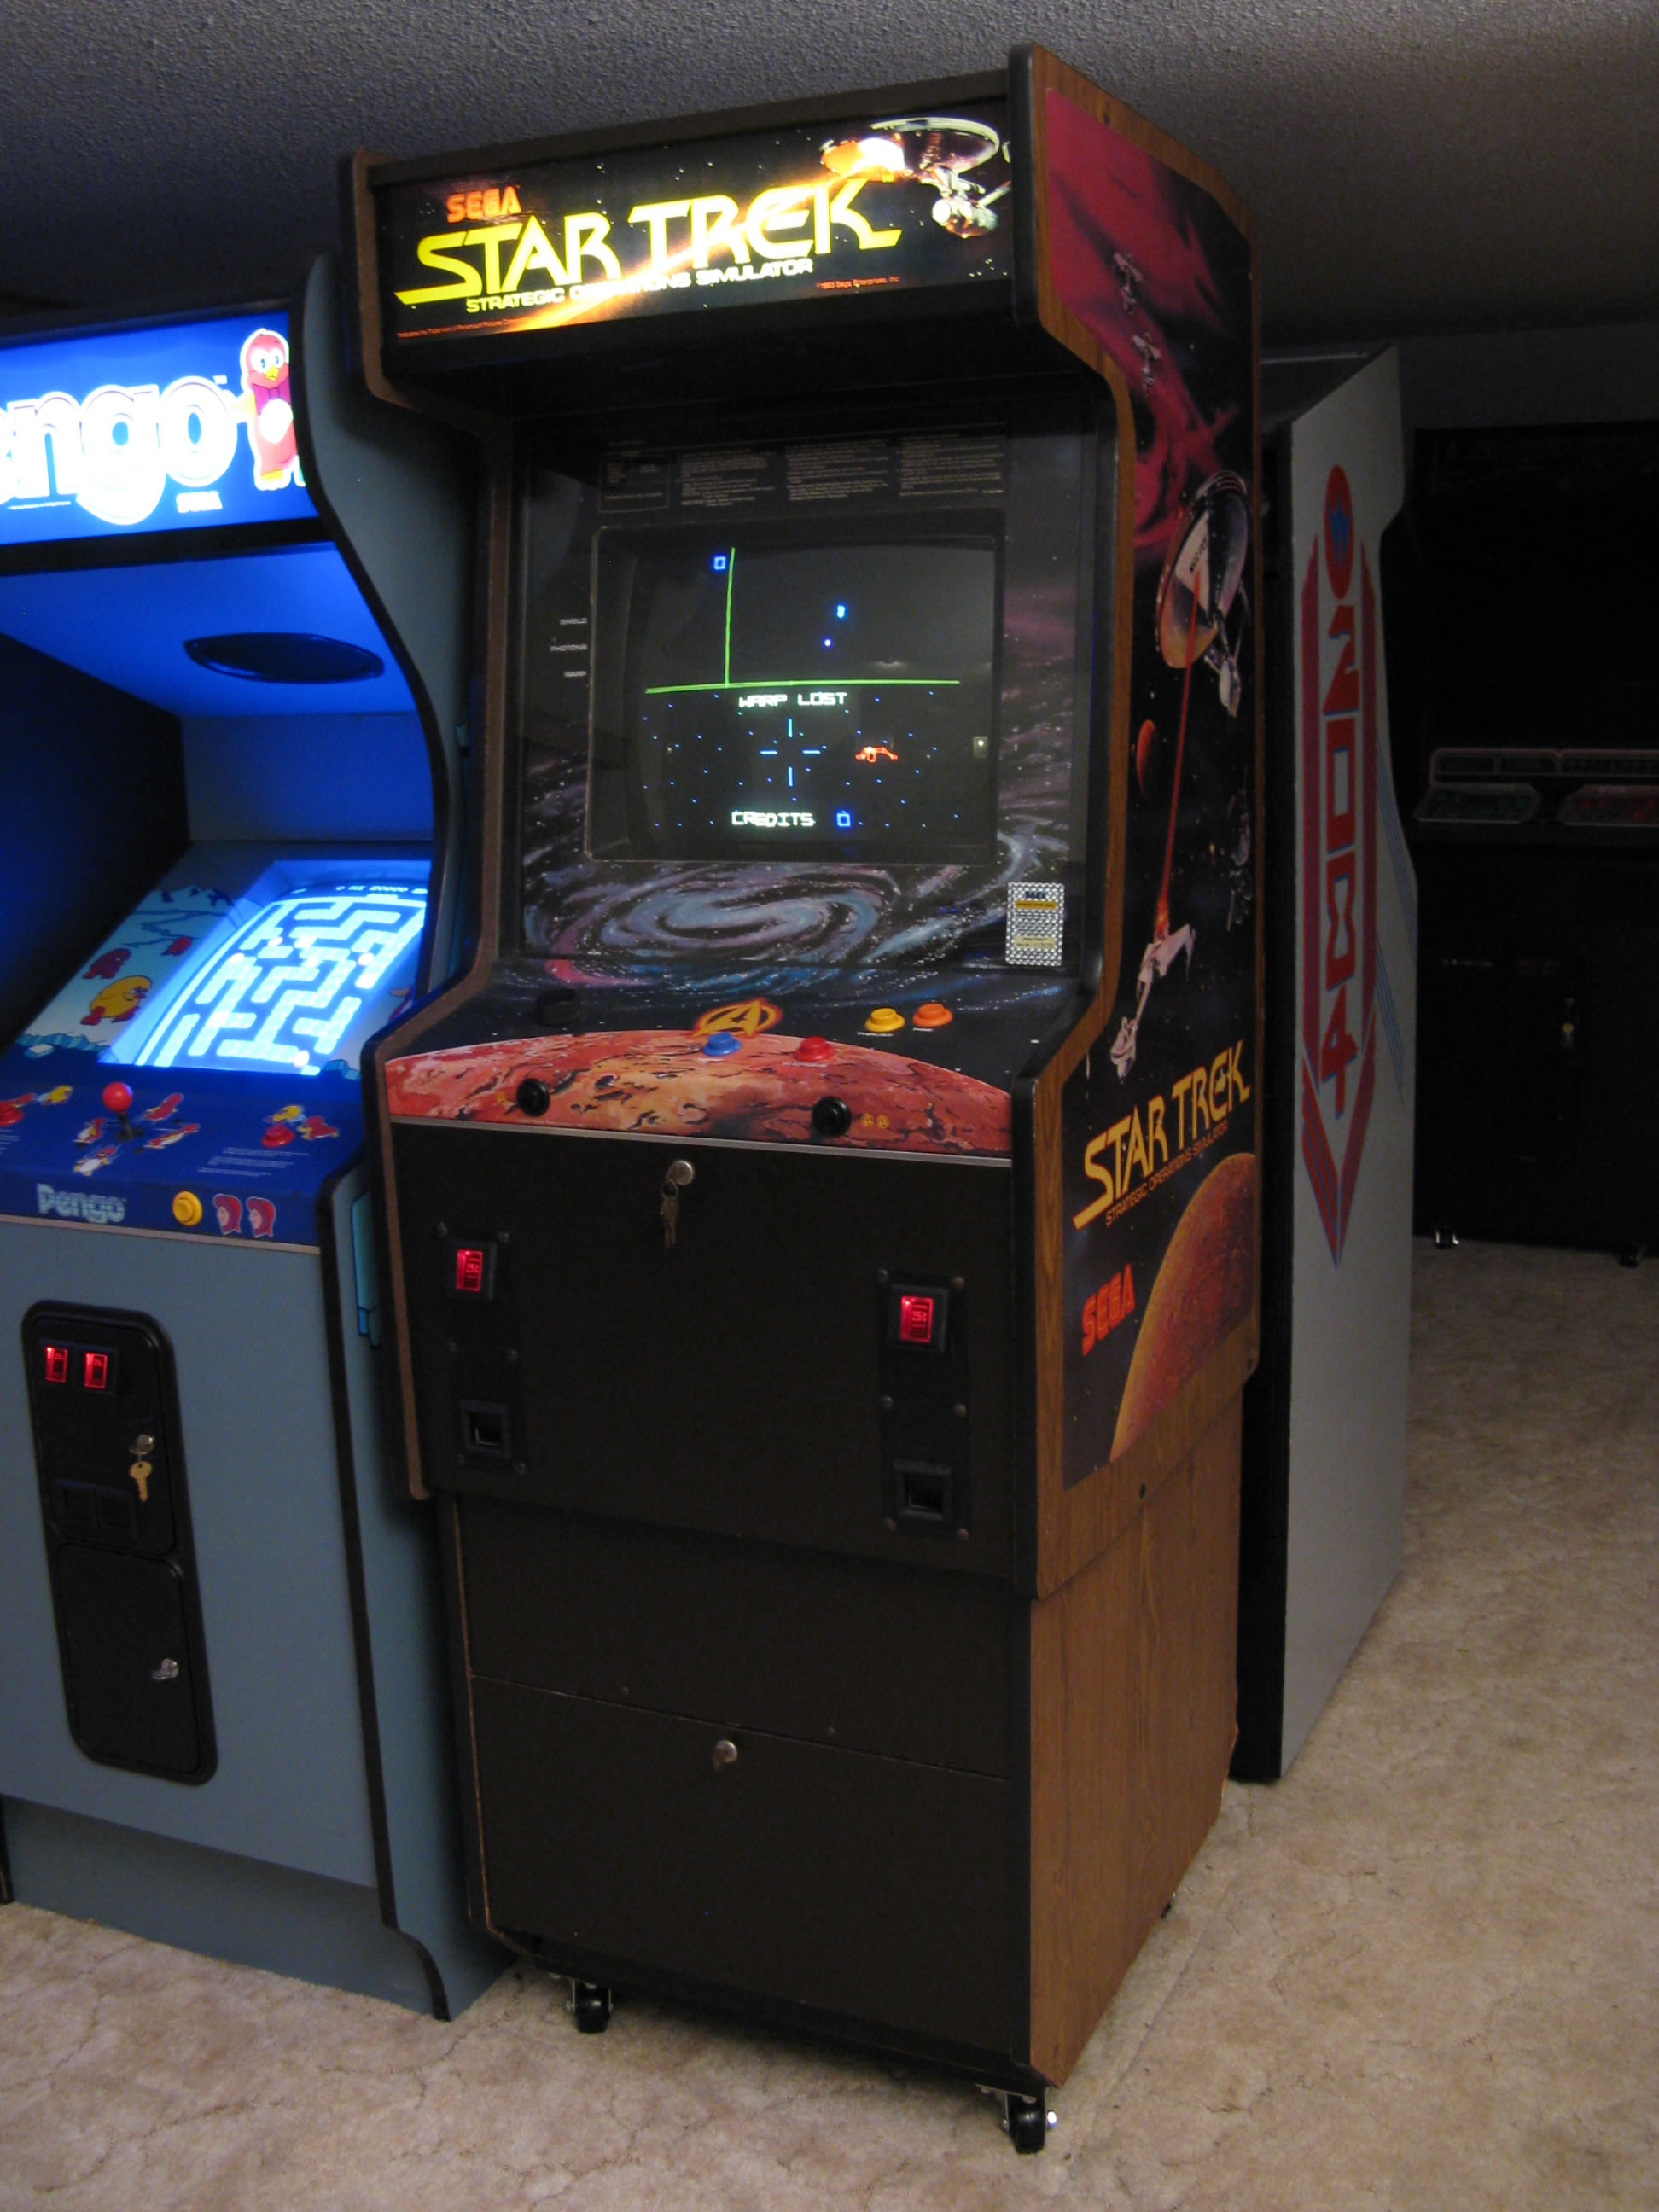 Star Trek at Bill's Classic Arcade